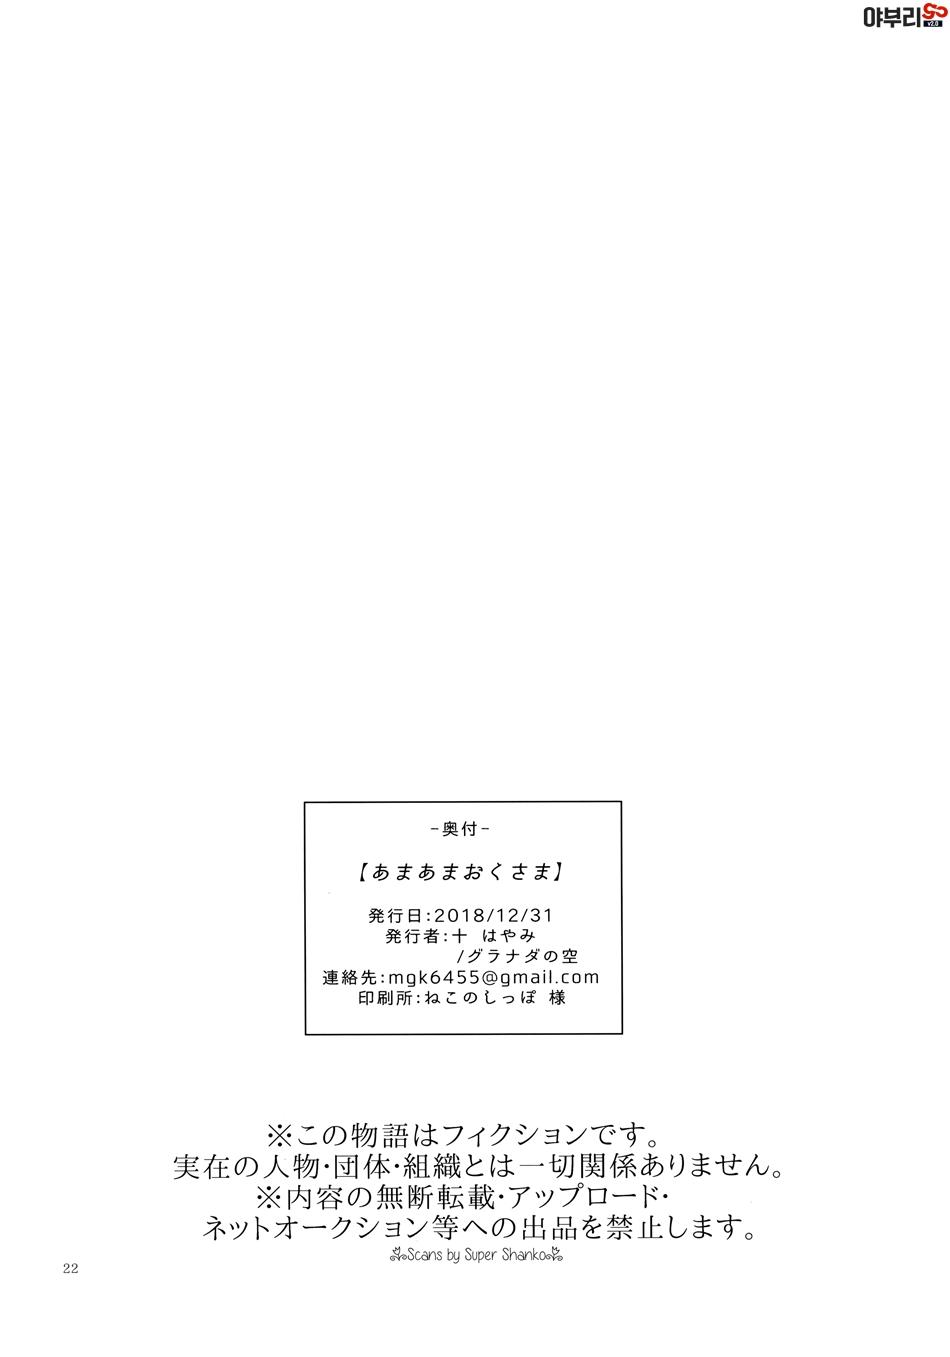 22_0scan_21.jpg